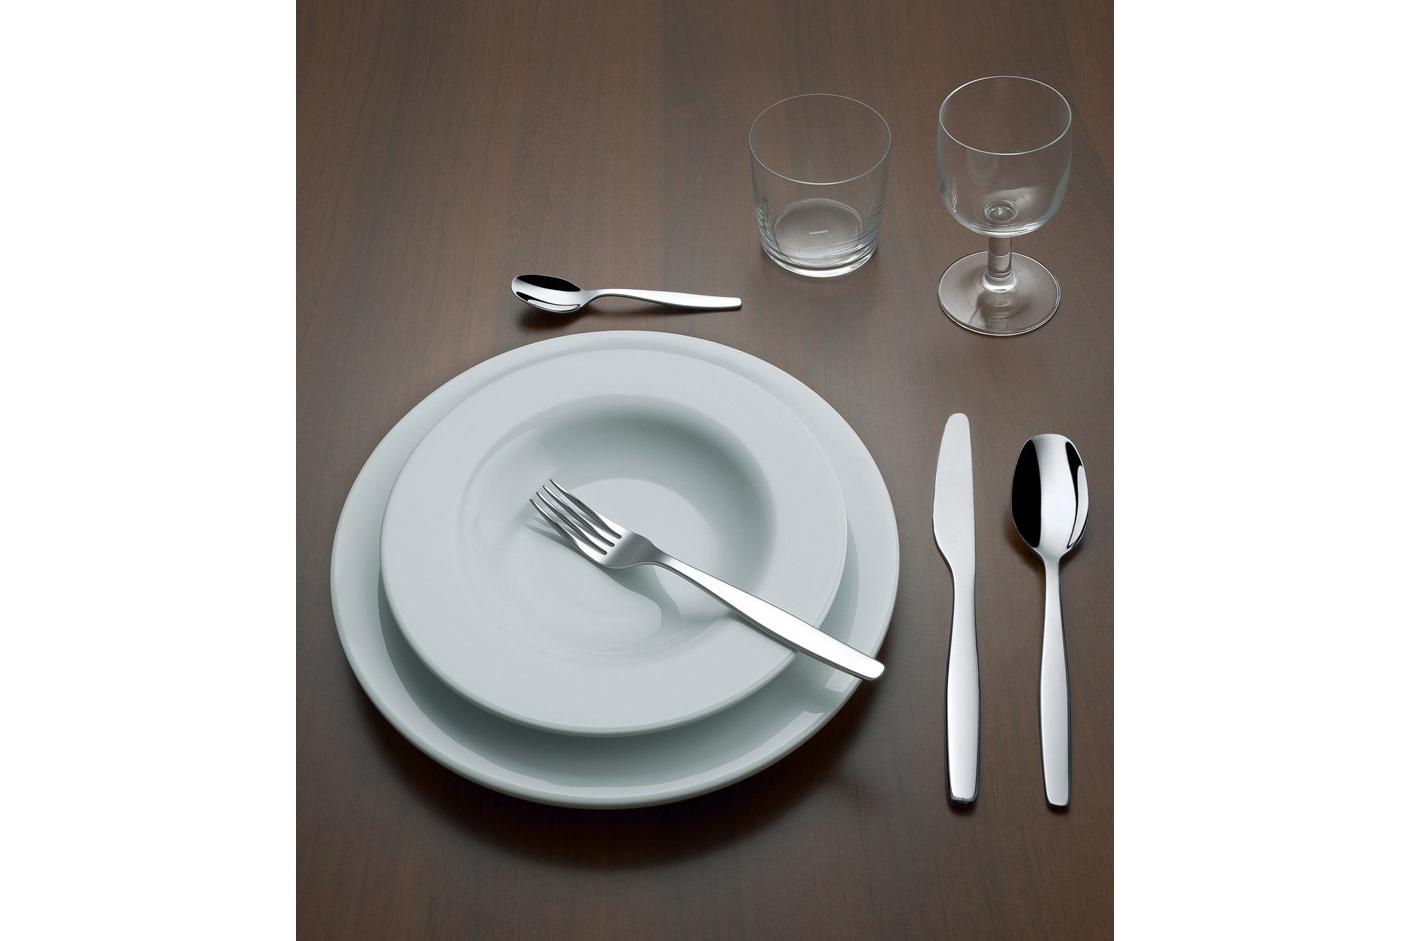 alessi-naoto-fukasawa-cutlery-designboom-4.jpg